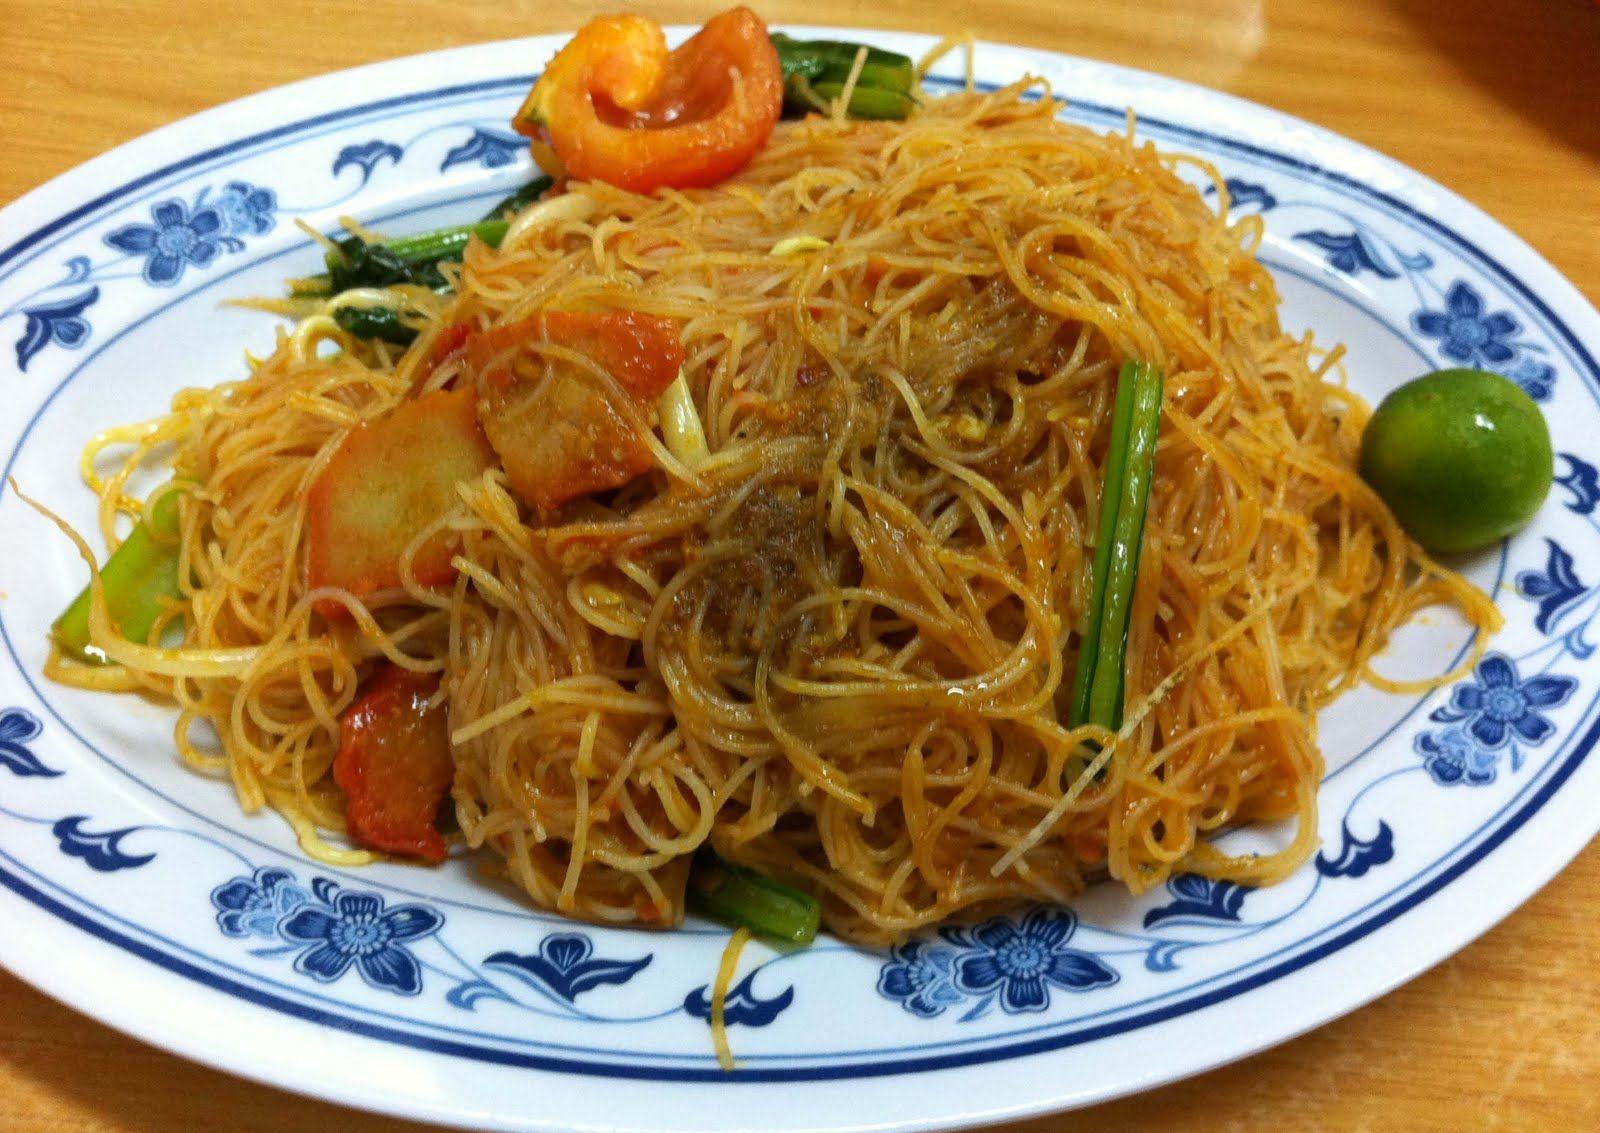 Vegeterian Foods | Sunny's Vegetarian Foodhunt: Ru Lai Zhai Vegetarian Food